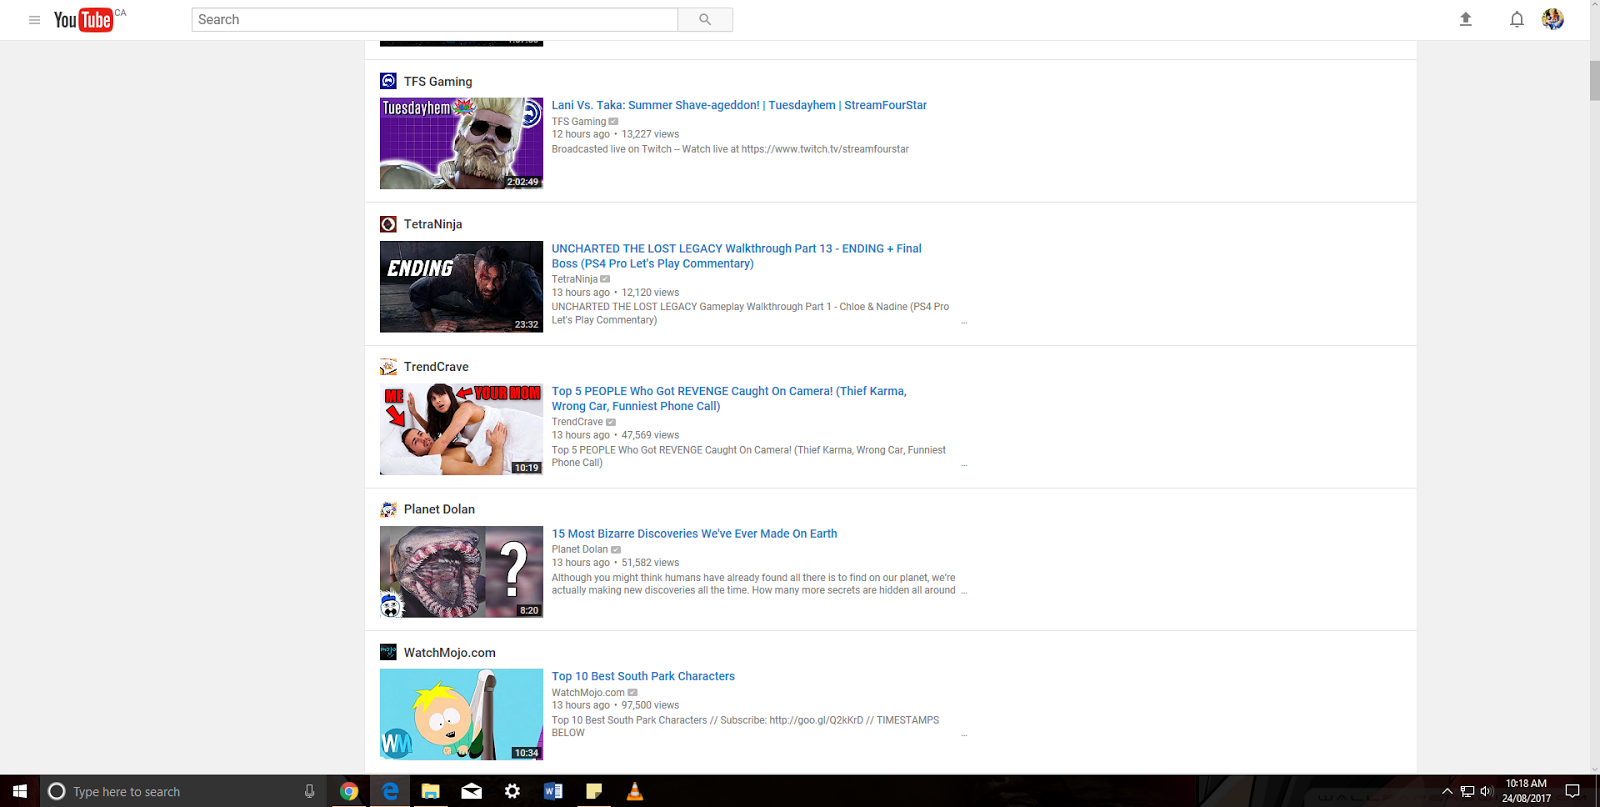 YouTube Left Hand Sidebar not working under Chrome/Edge/FFox